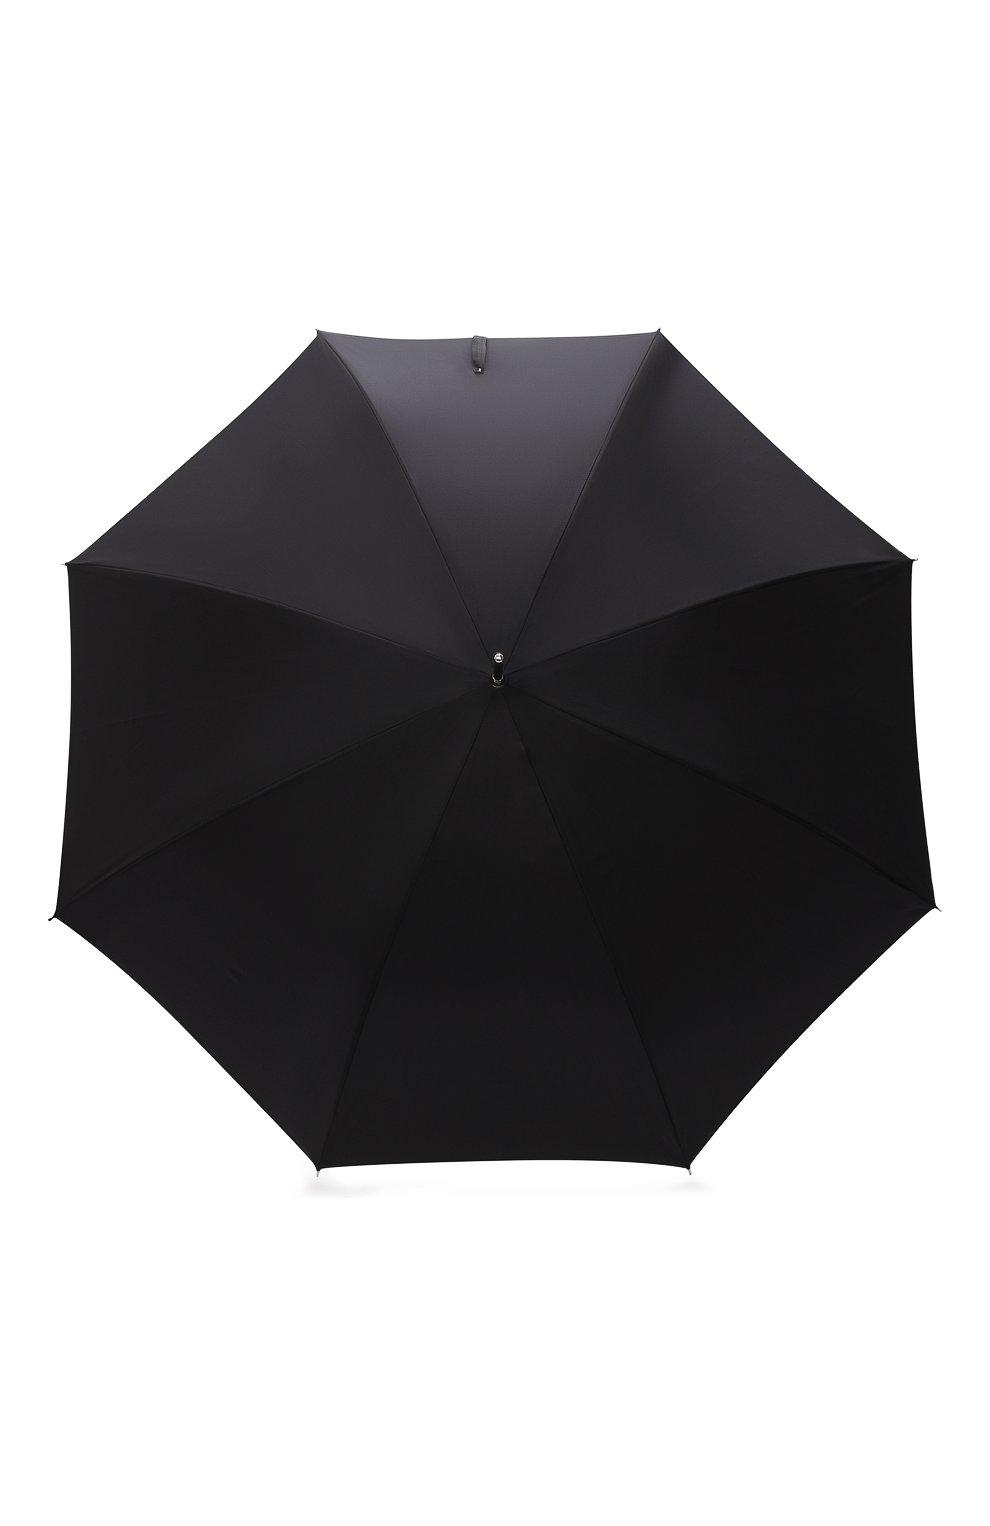 Мужской зонт-трость PASOTTI OMBRELLI черного цвета, арт. 478/RAS0 0XF0RD/18/W09   Фото 1